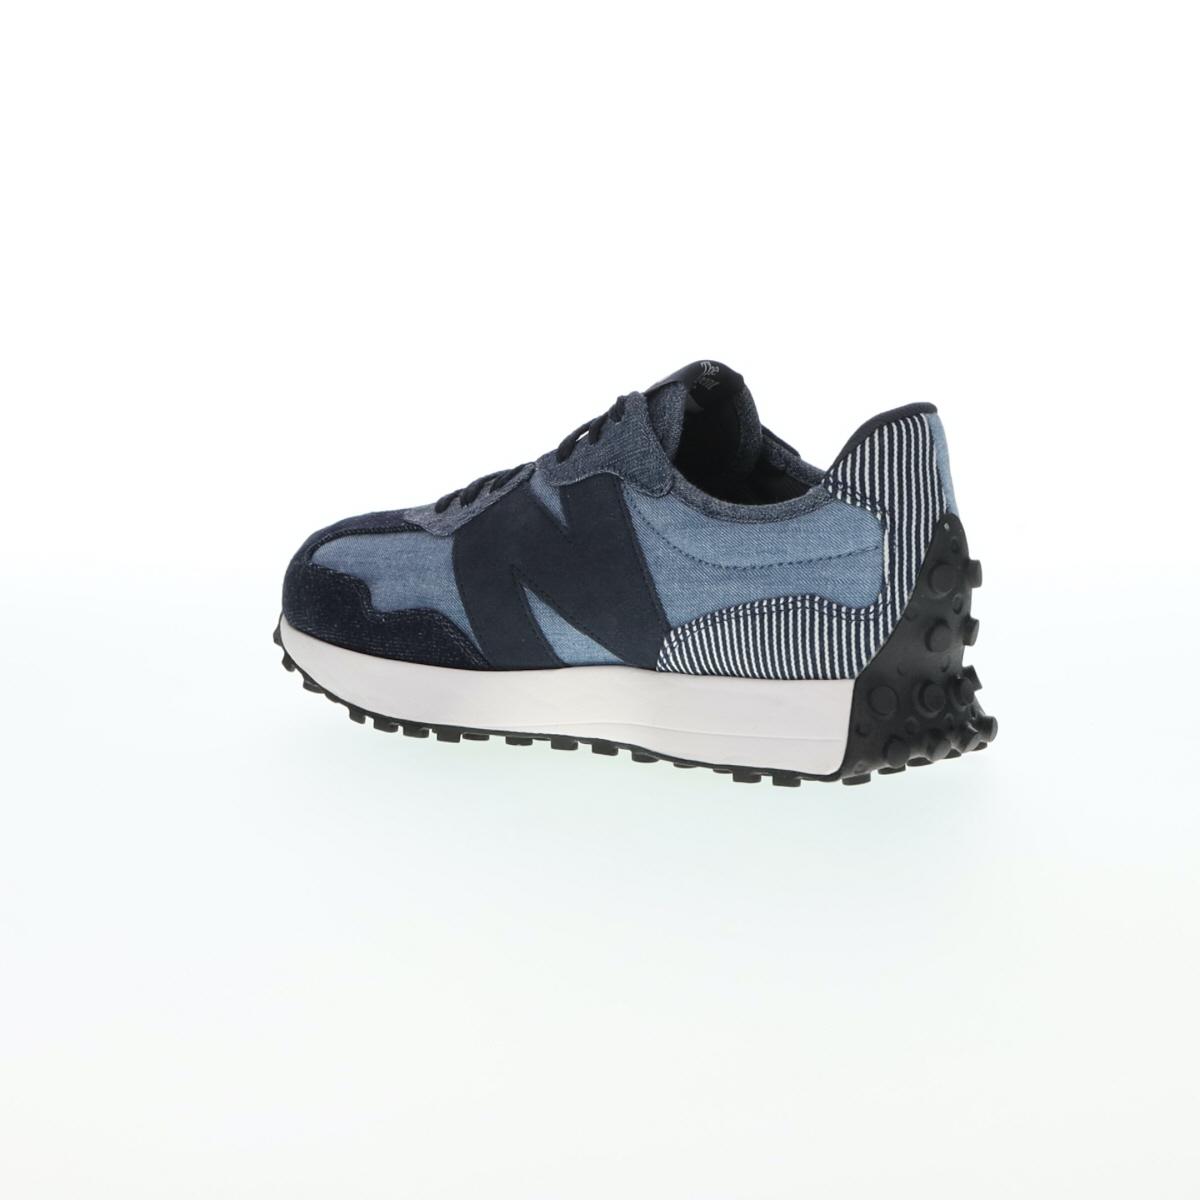 sportovni obuv adidas shoes online